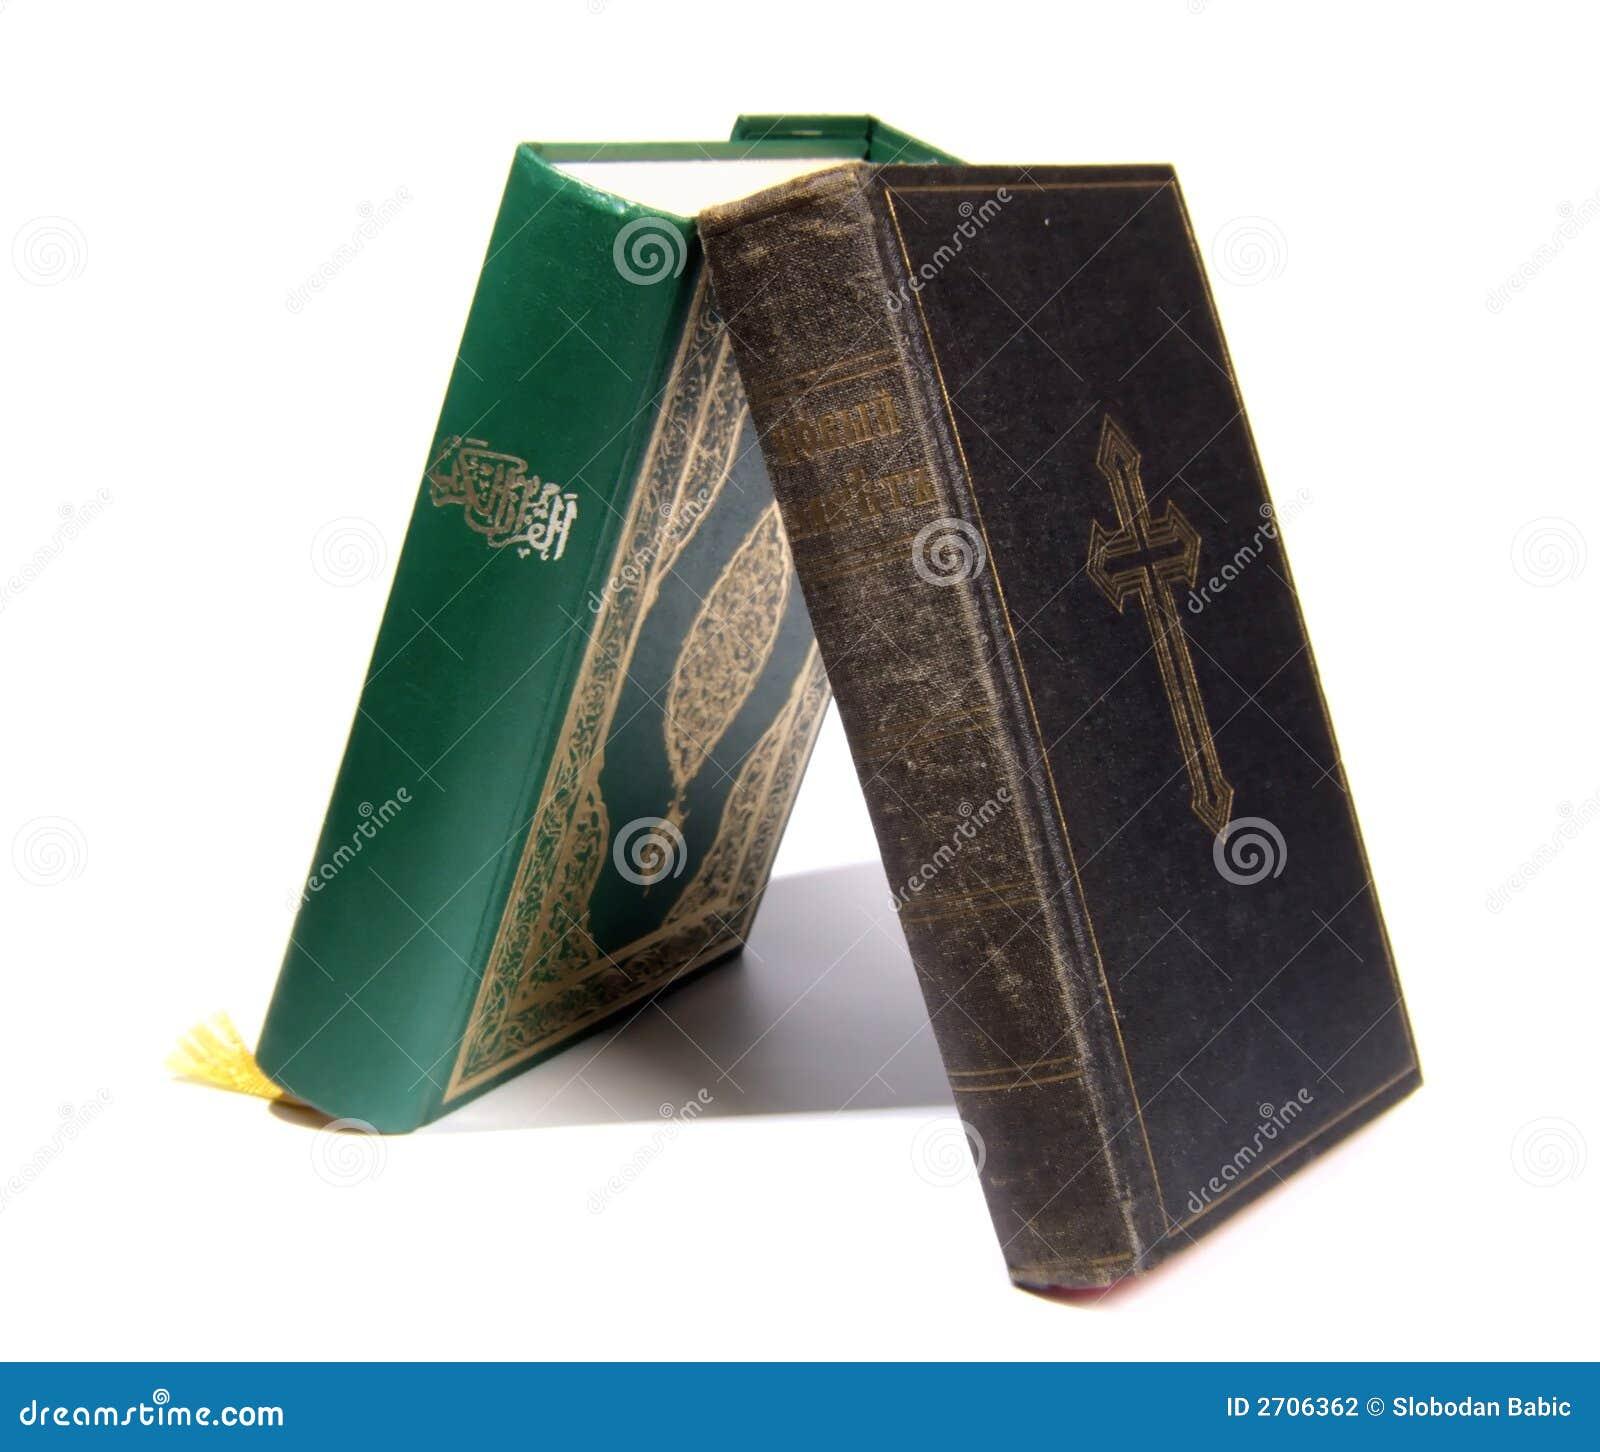 Koran Vs Bible Stock Photography - Image: 2706362